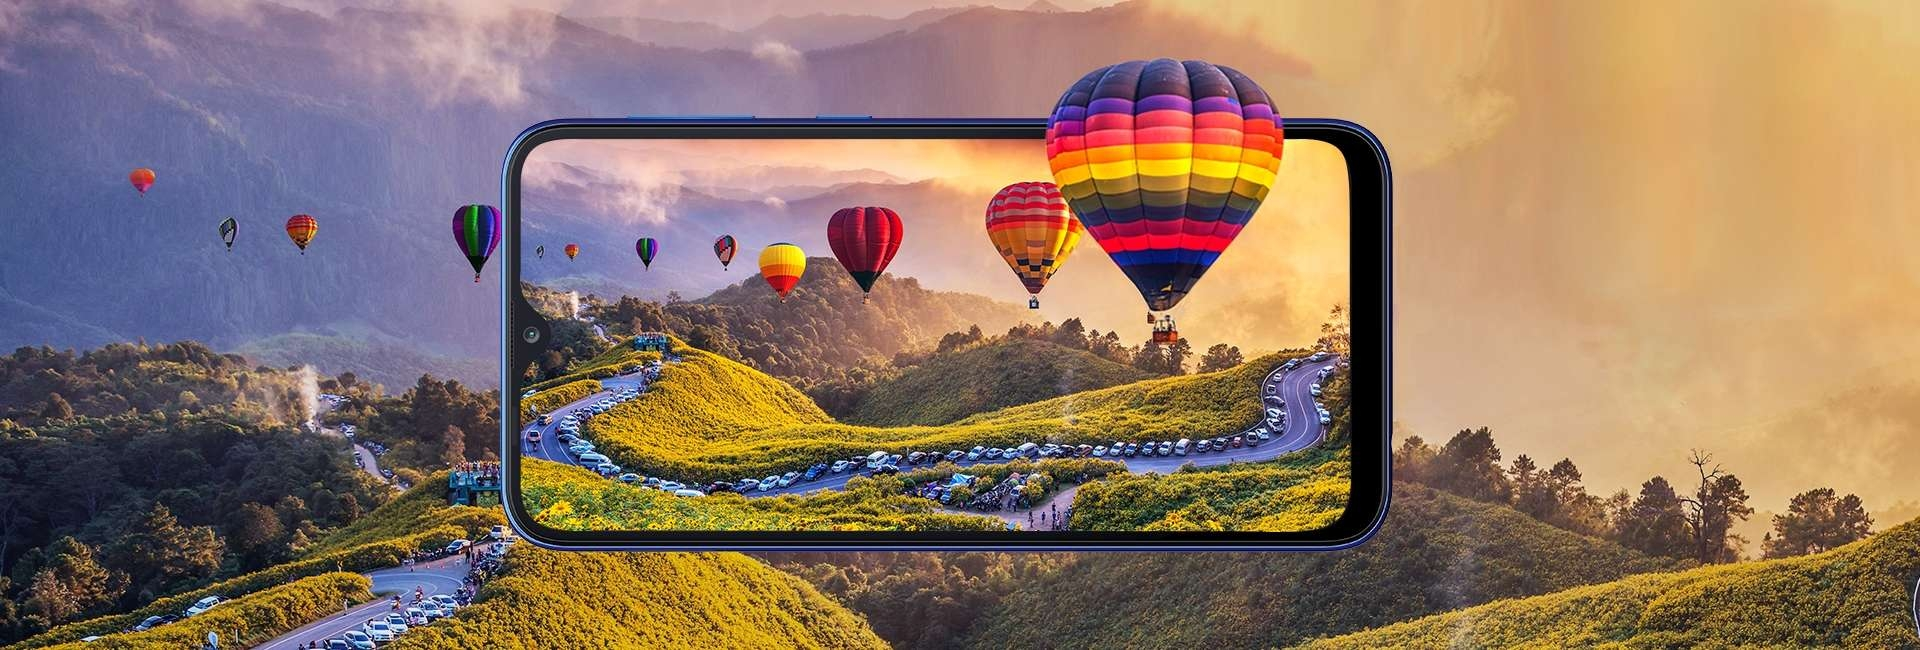 Infinity V Display + HD Resolution - Samsung Galaxy A10